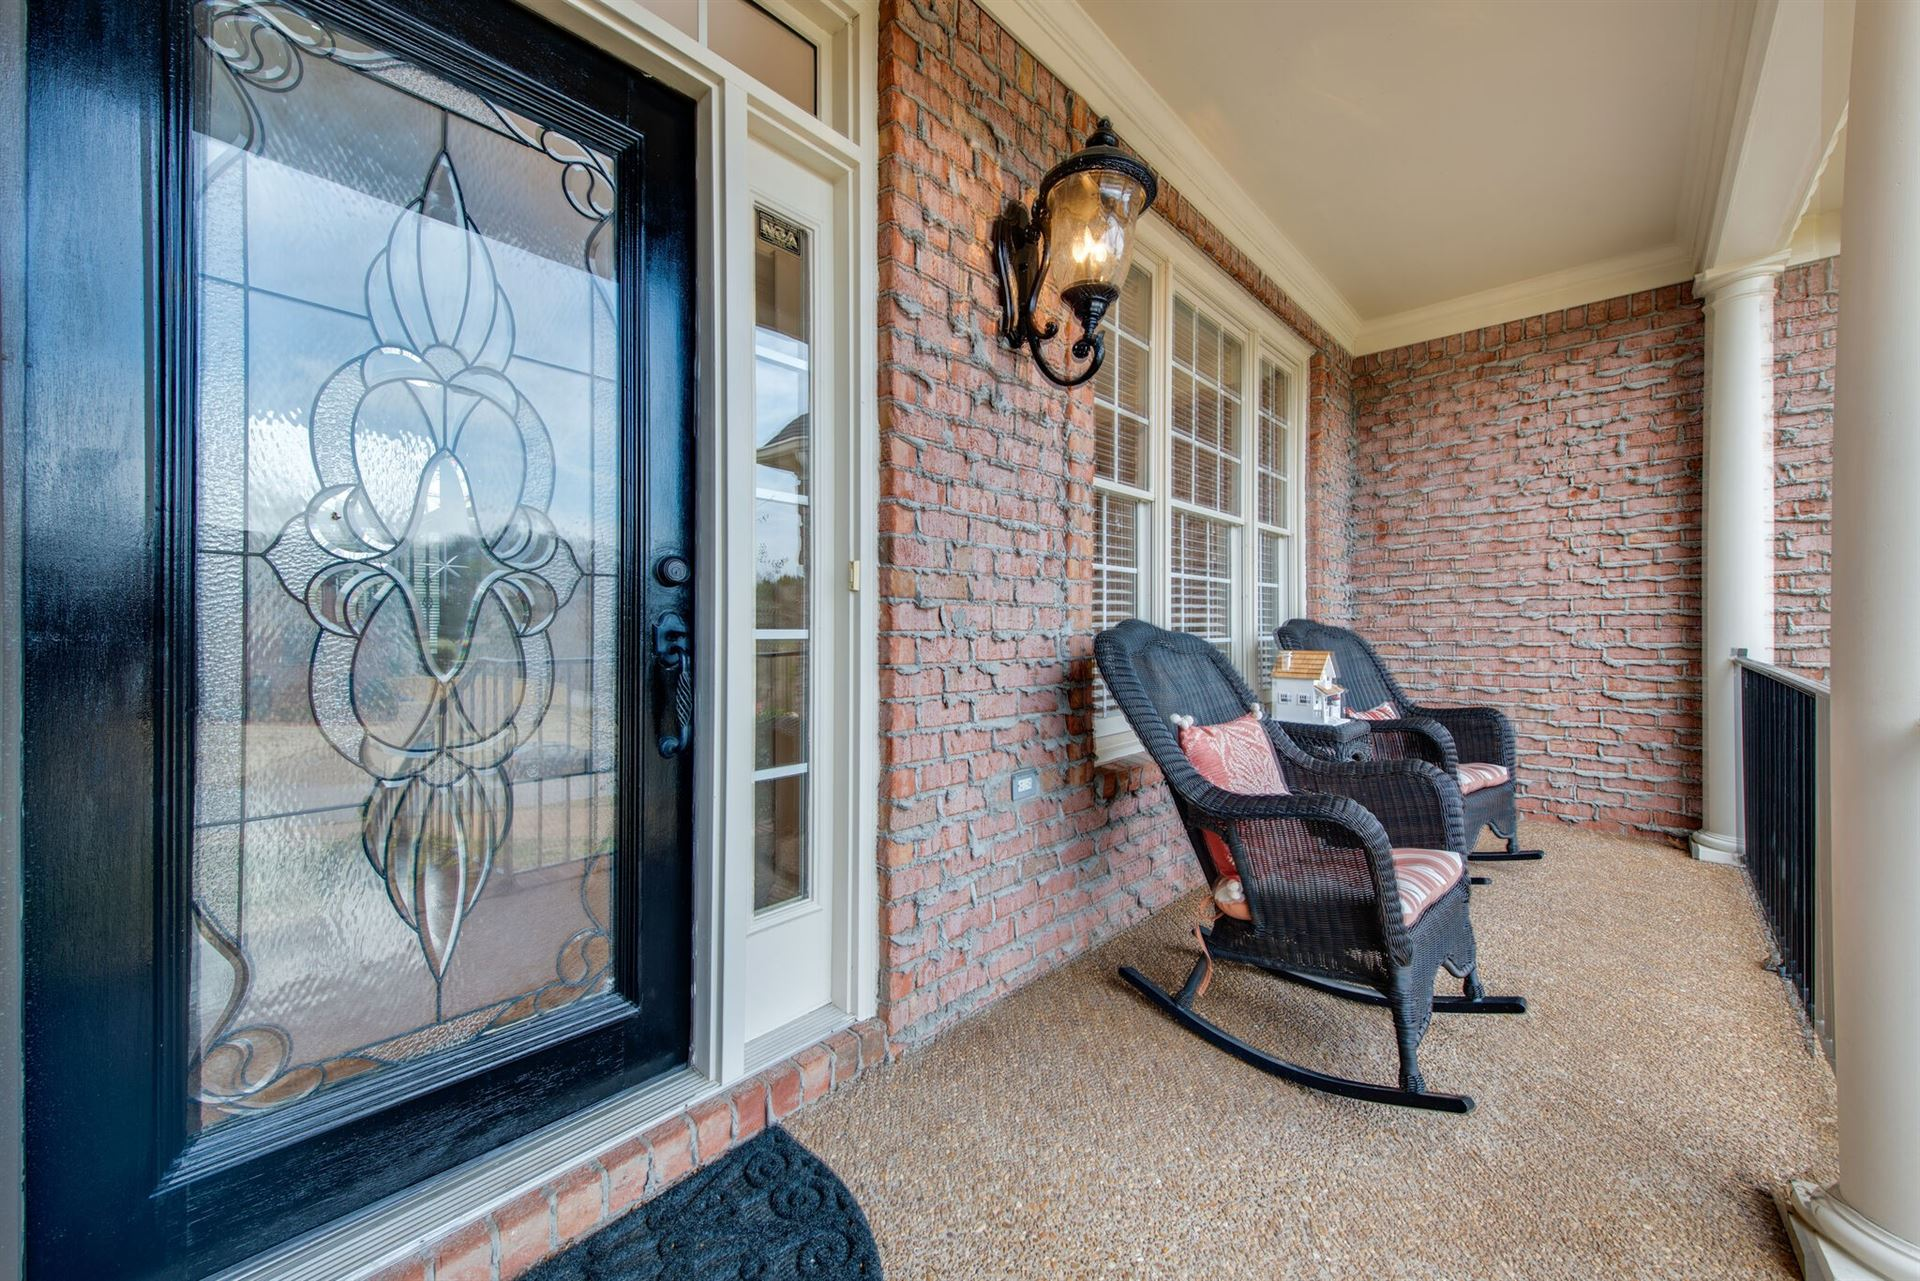 Photo of 950 Pinkerton Ct, Brentwood, TN 37027 (MLS # 2221803)